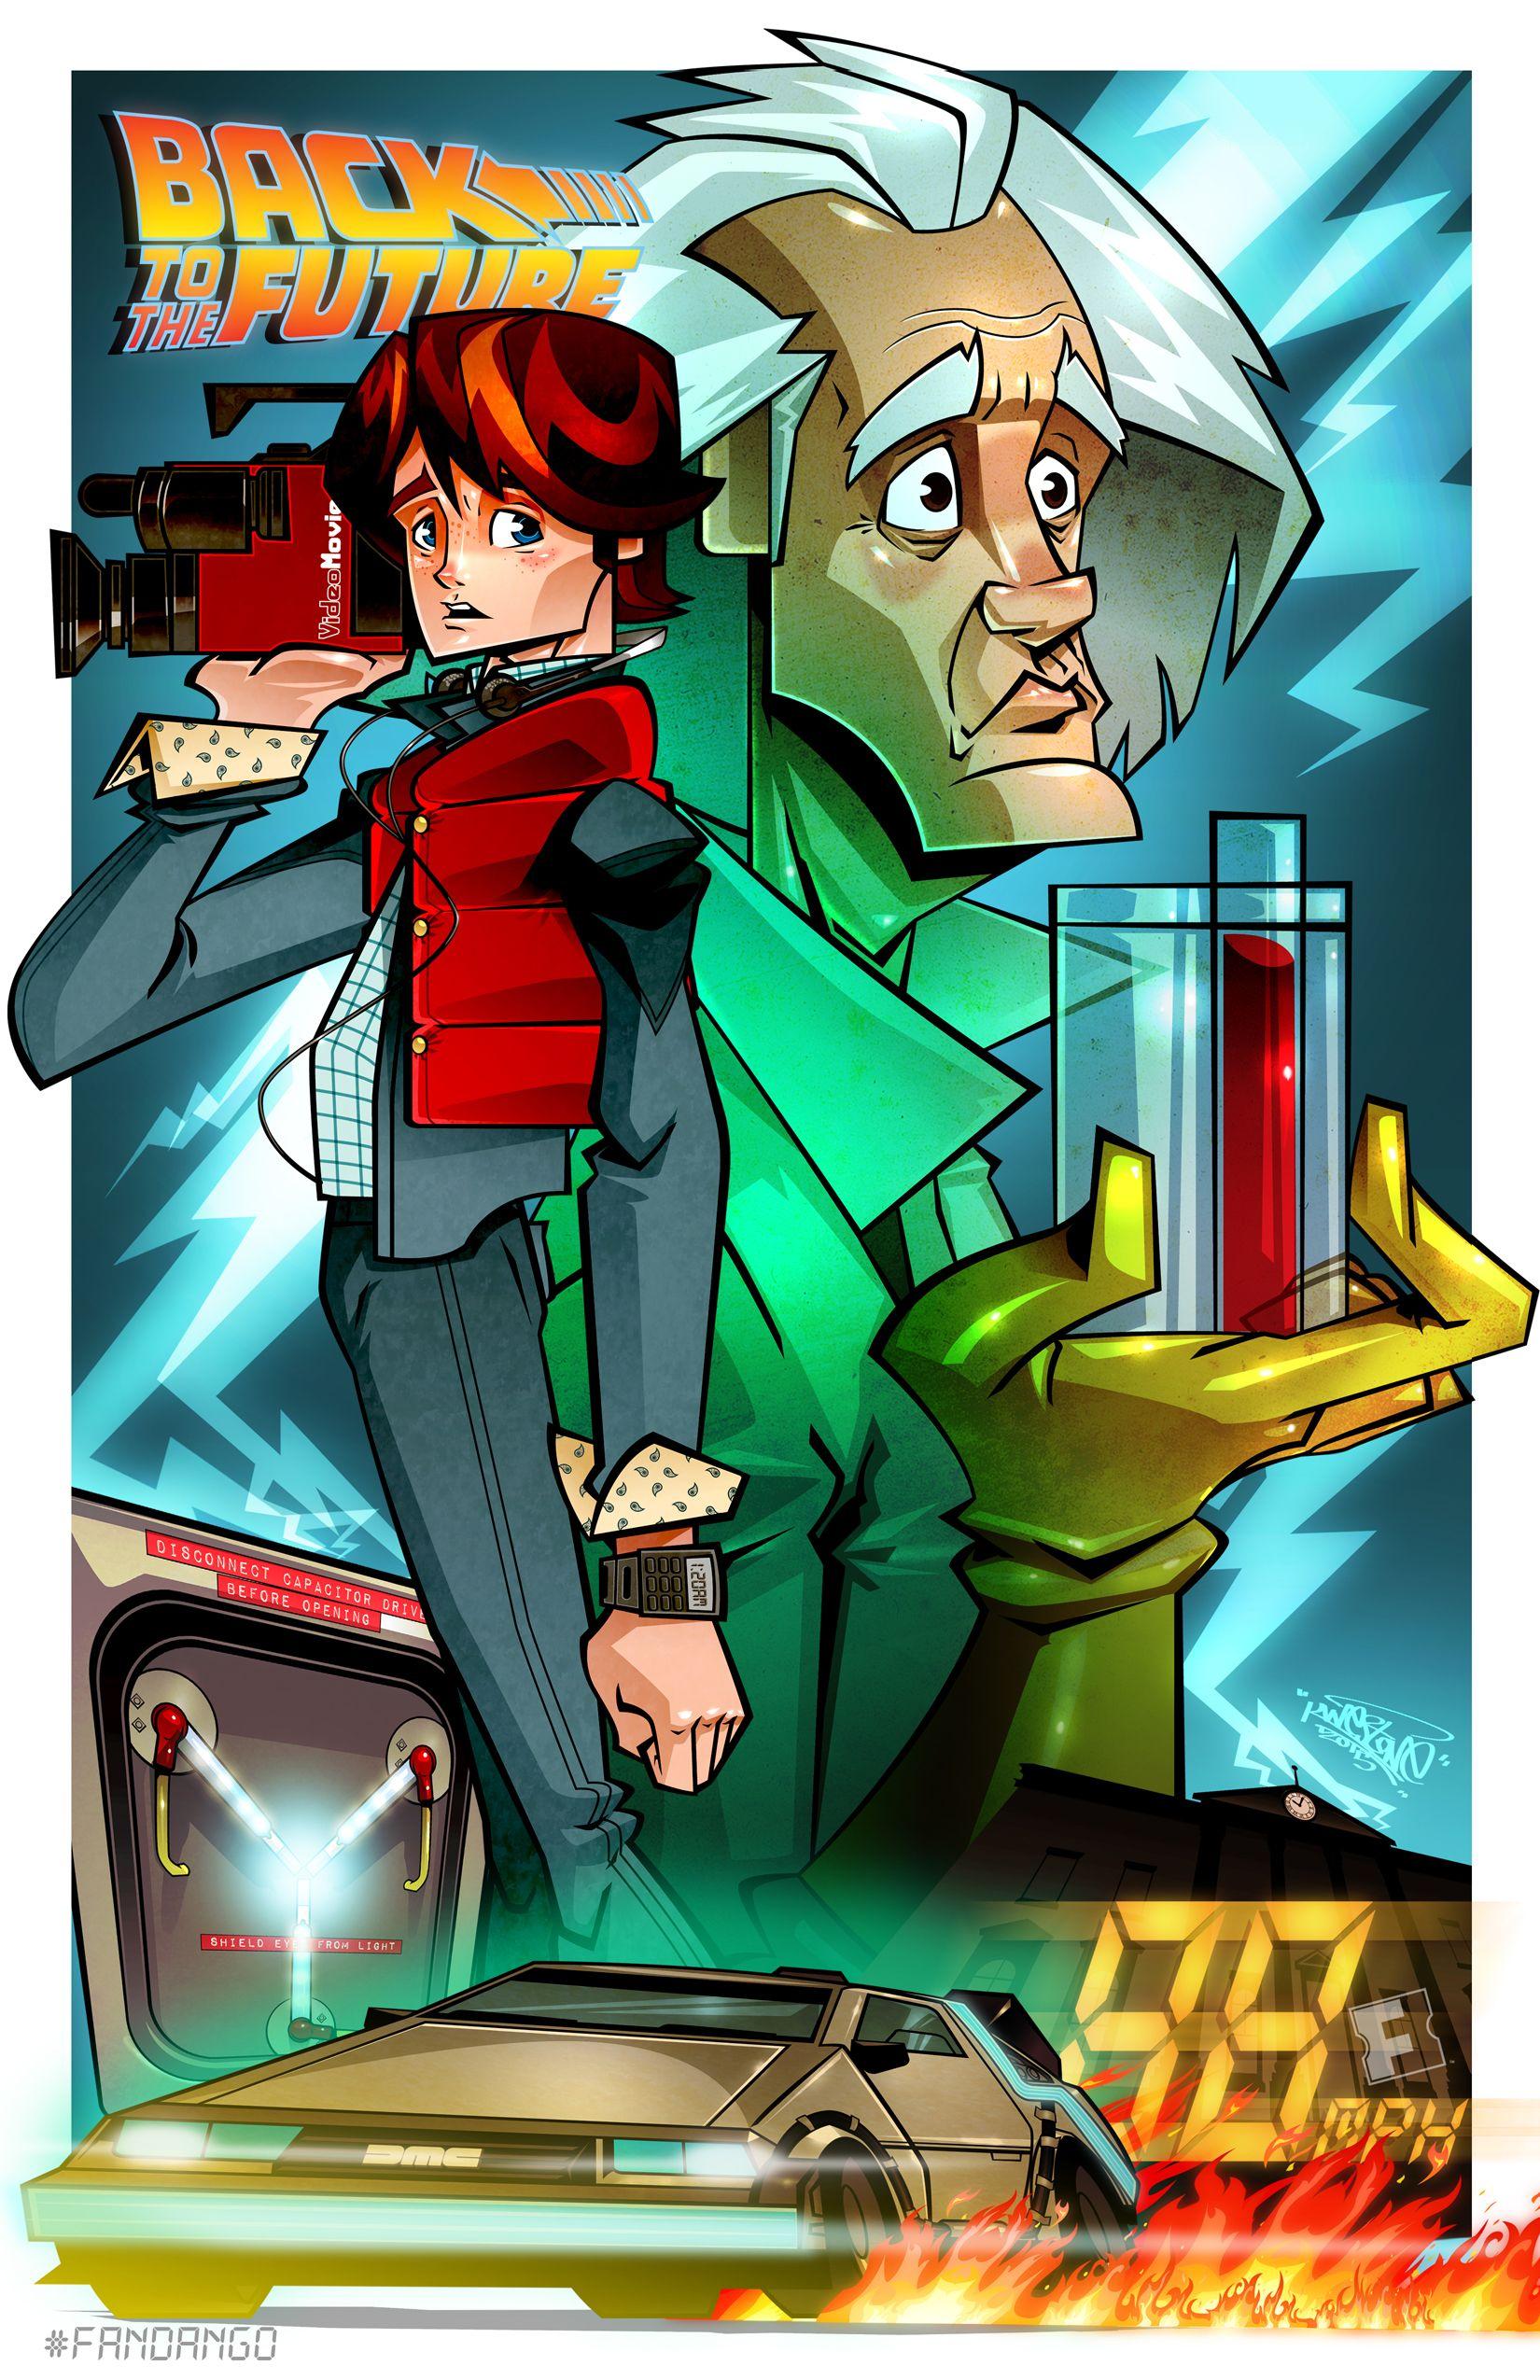 The Avengers Infinity War Fandango Marvel Art Poster Print T376 A4 A3 A2 A1 A0|